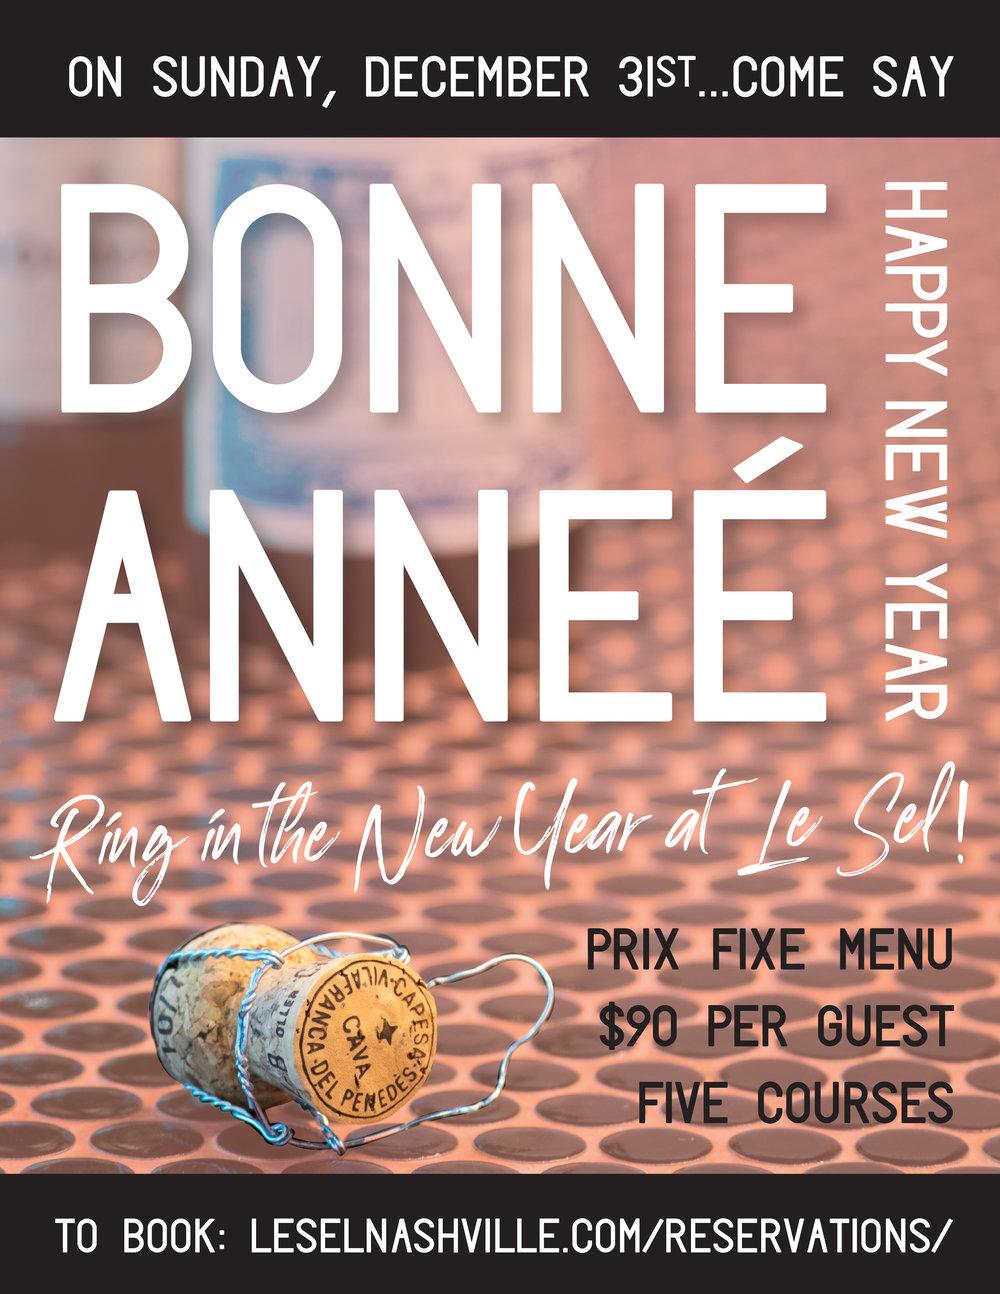 BONNE_ANNEE-01.jpg